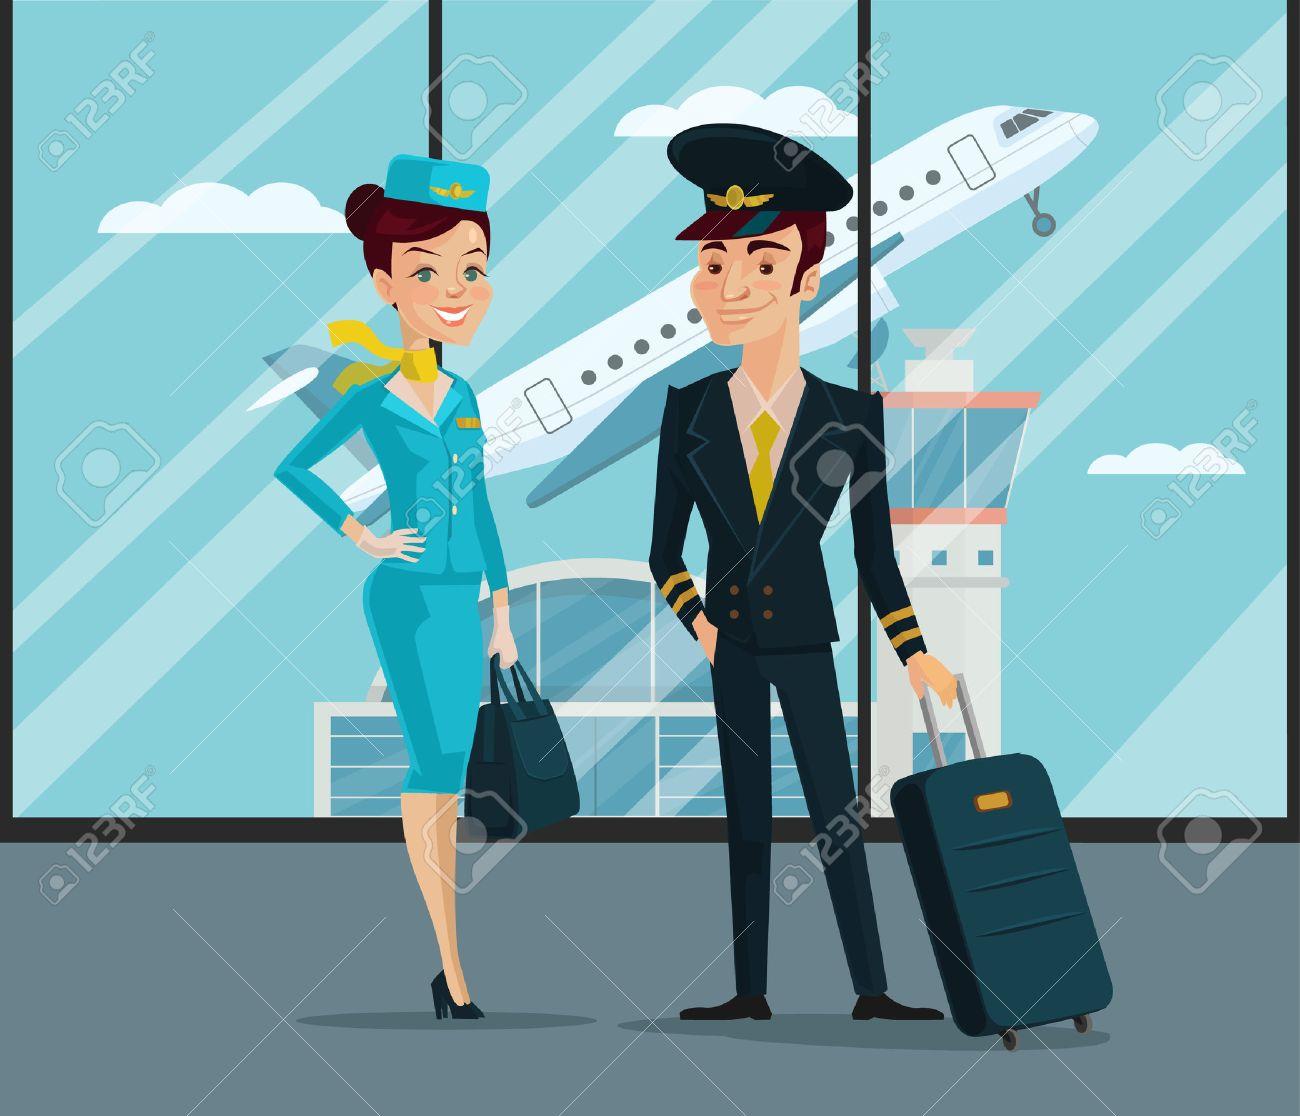 Pilot and stewardess. Vector cartoon illustration - 53826824